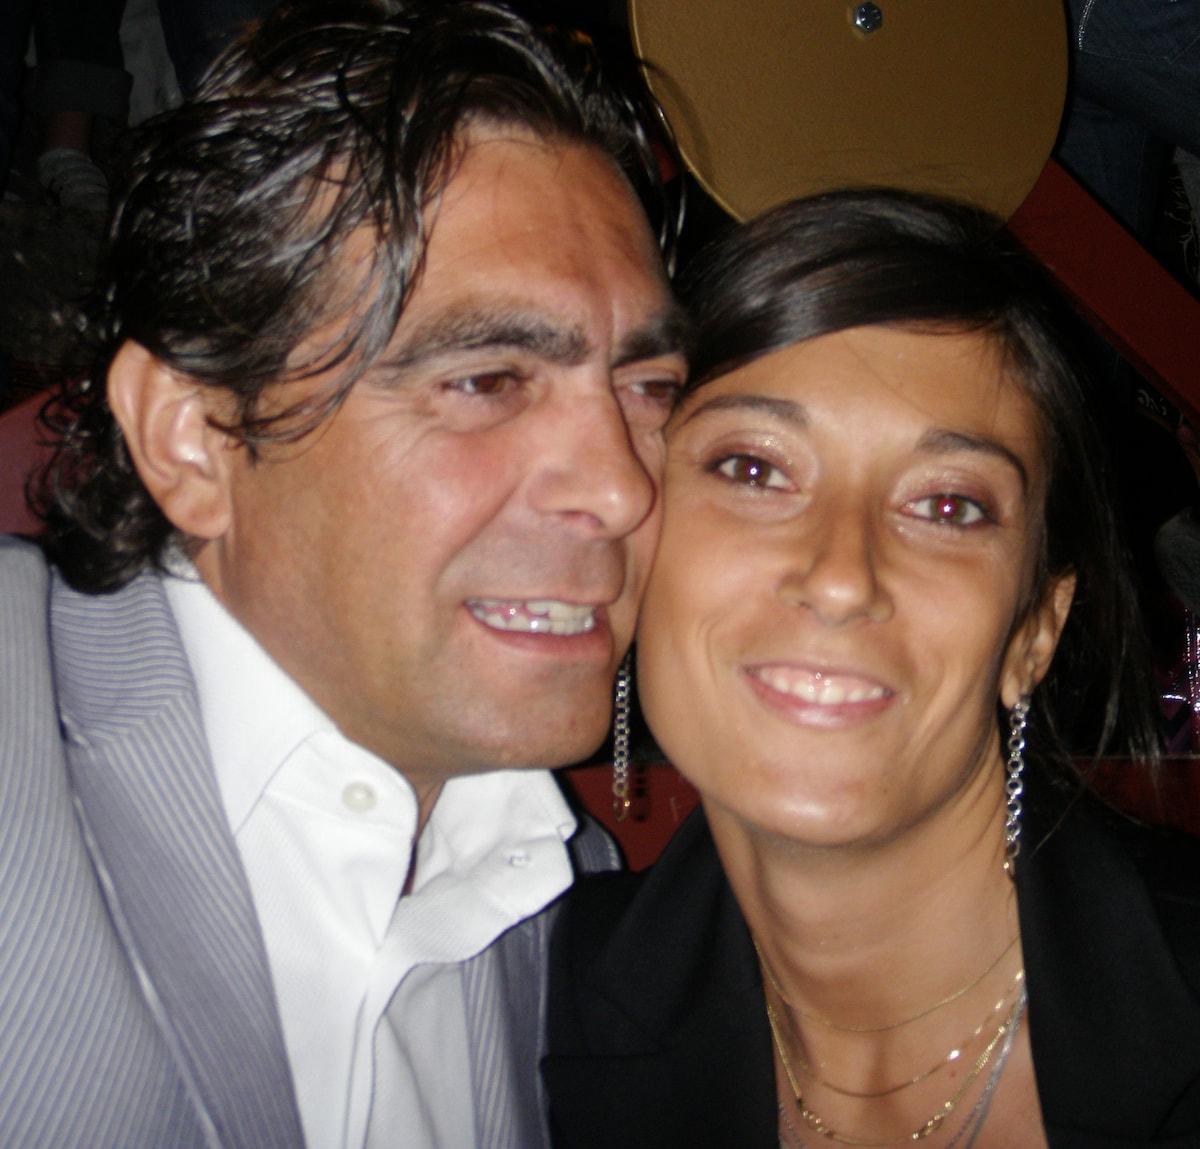 Francesca from Verona